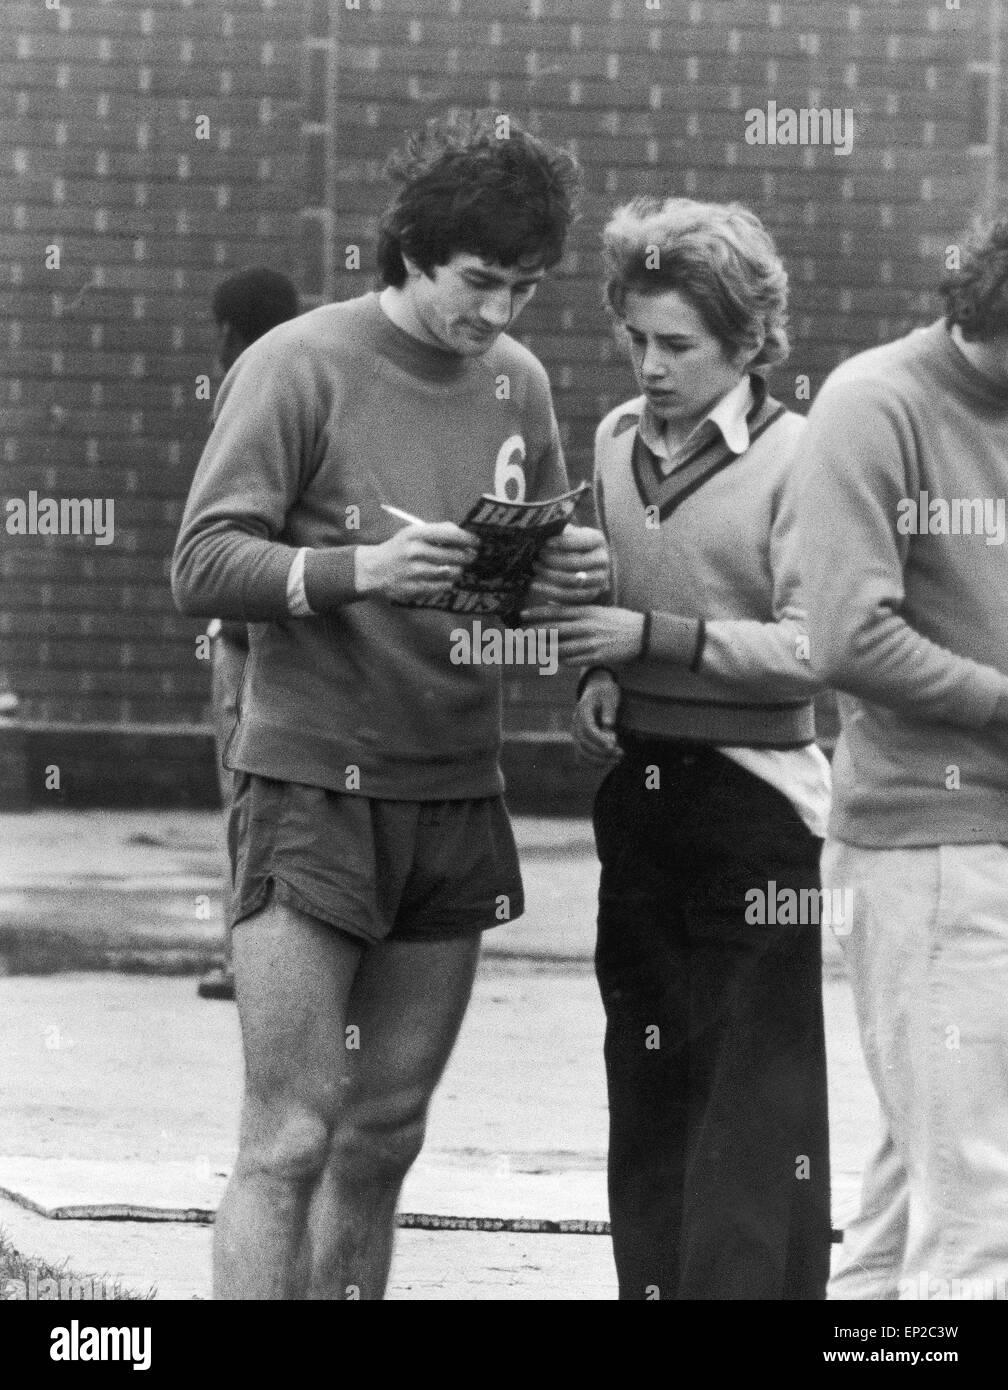 Dennis Mortimer signs his autograph for a fan at Villa Park. 12th April 1976. - Stock Image